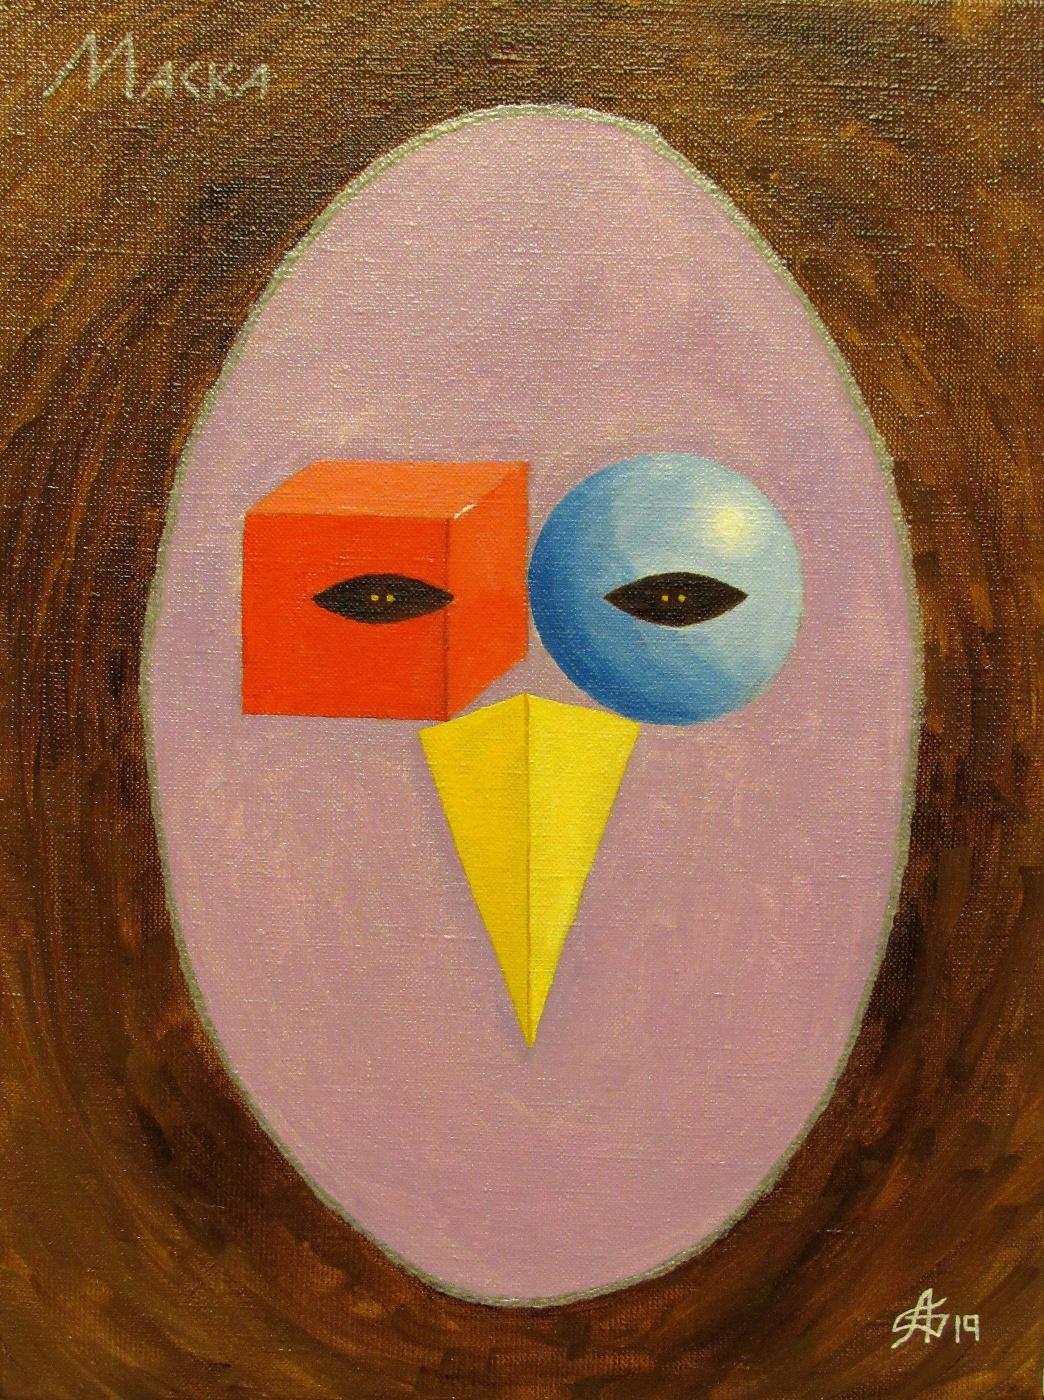 "Арташес Владимирович Бадалян. Mask (from the cycle ""Symbolic geometry"") - xm - 40x30"